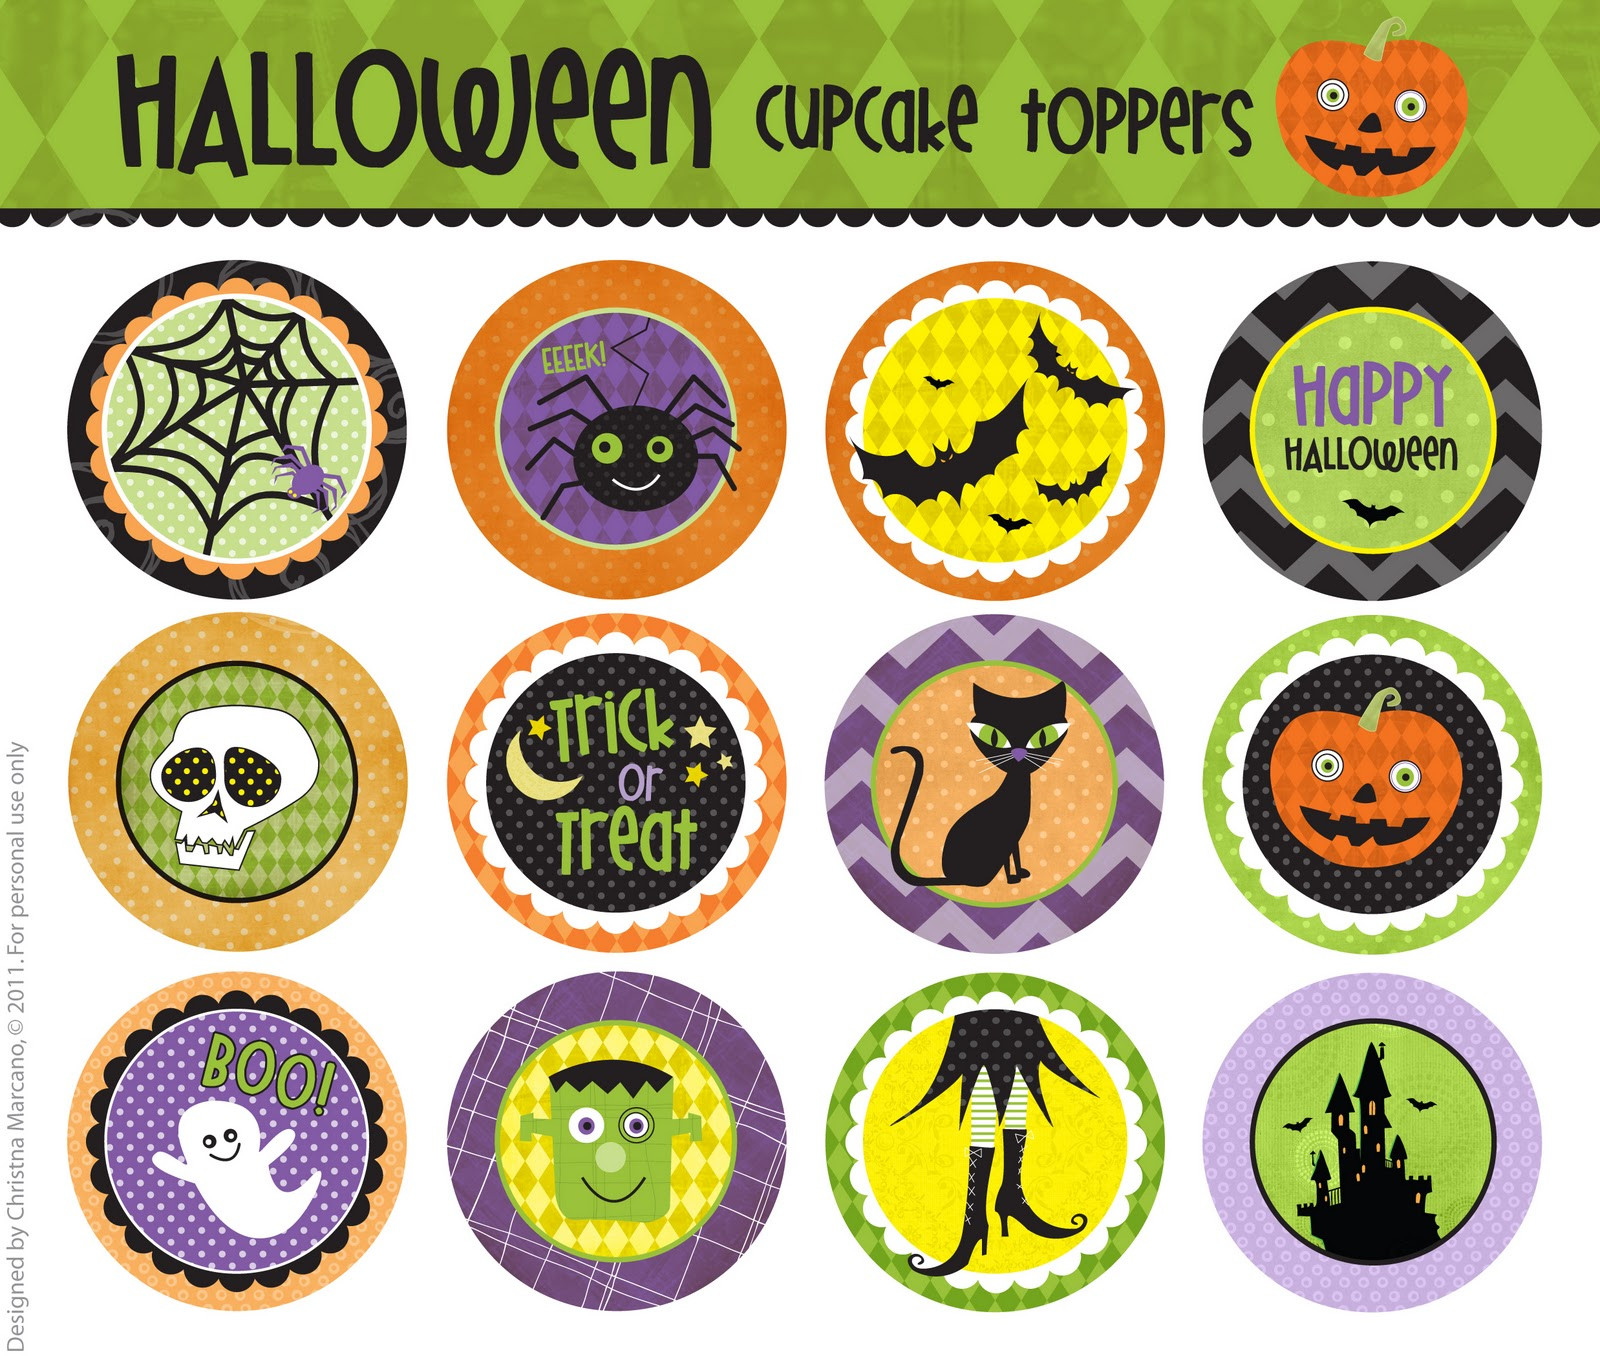 Halloween Cupcakes Toppers  cm2 Halloween Cupcake Toppers F R E E printable